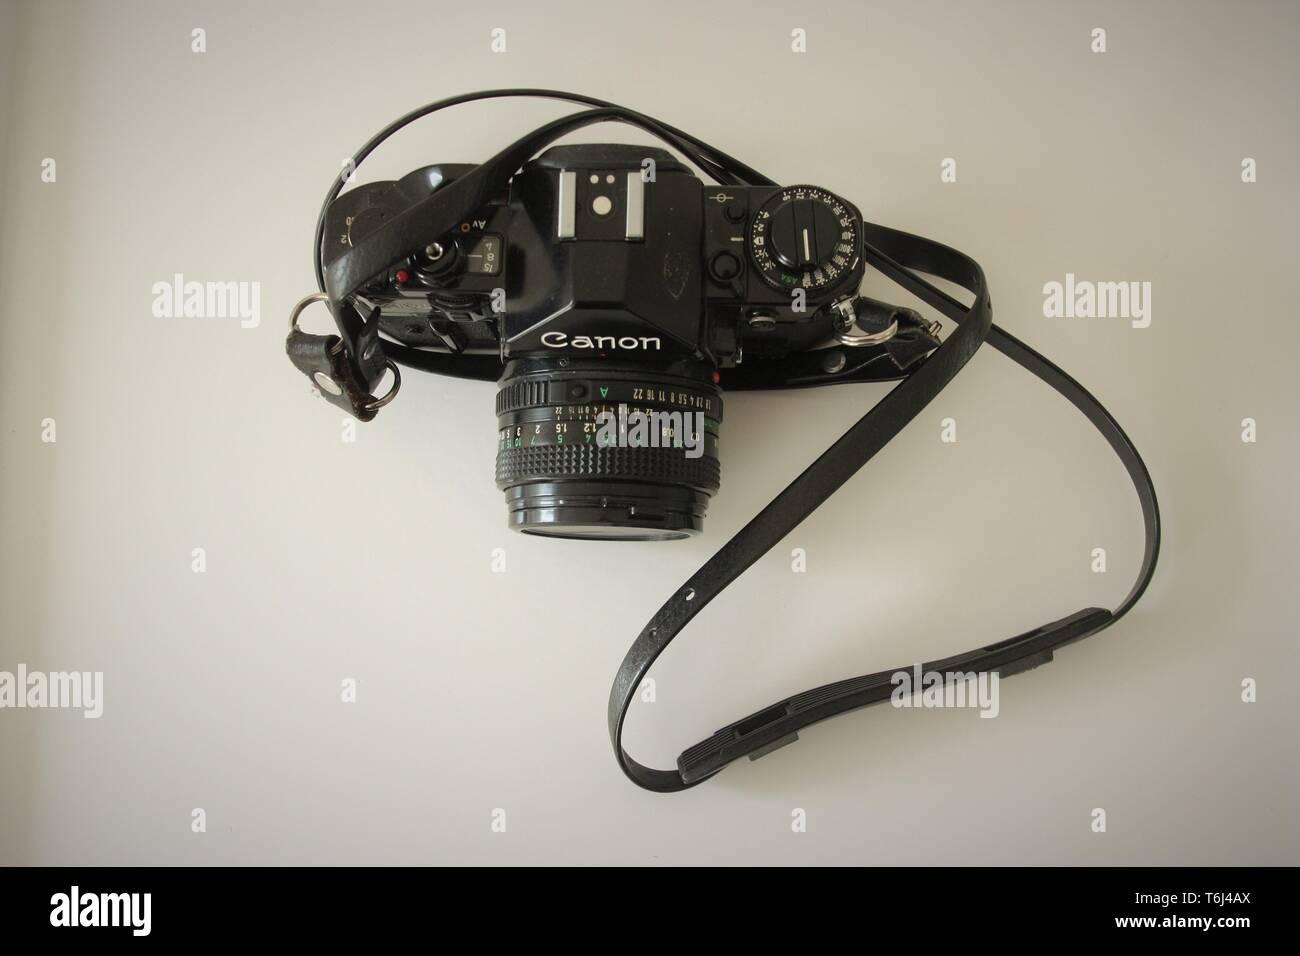 Canon A 1 camera - Stock Image